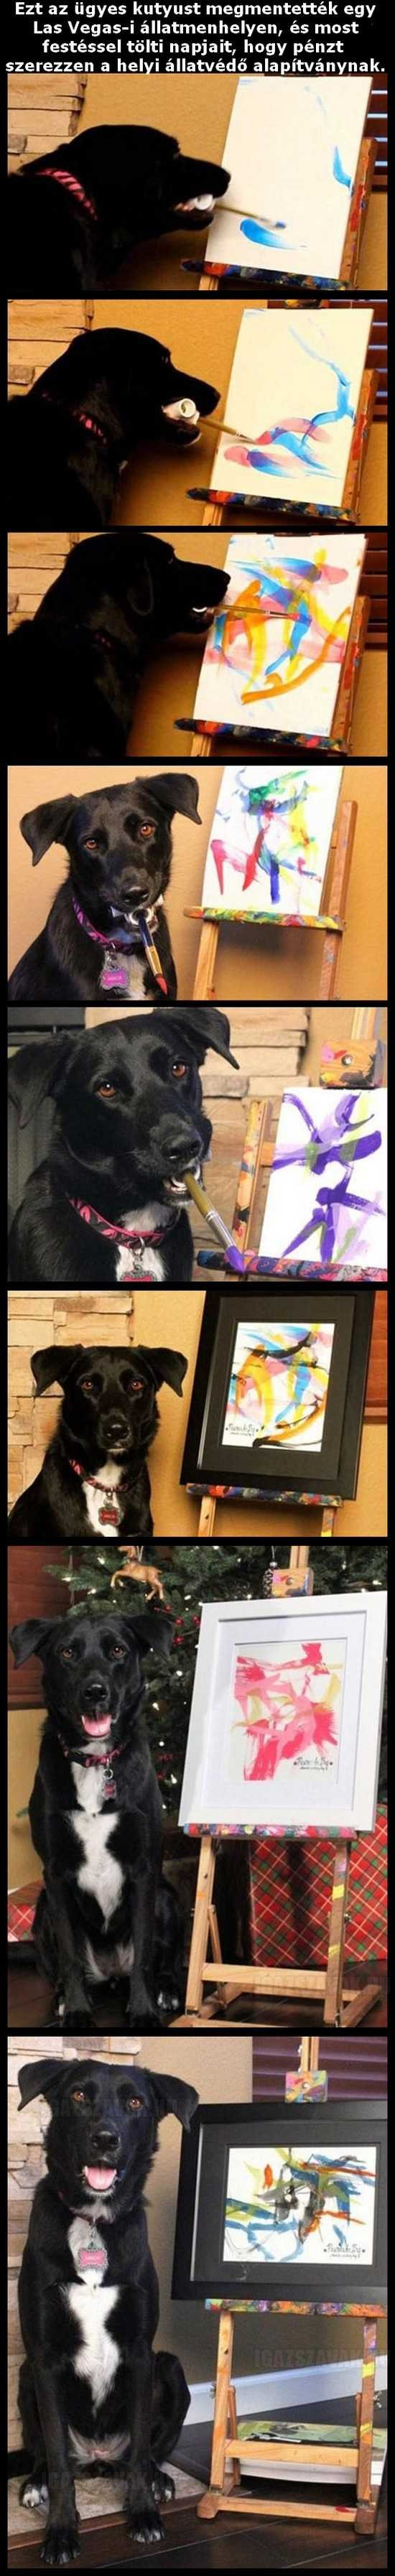 Egy kutyus aki tud festeni